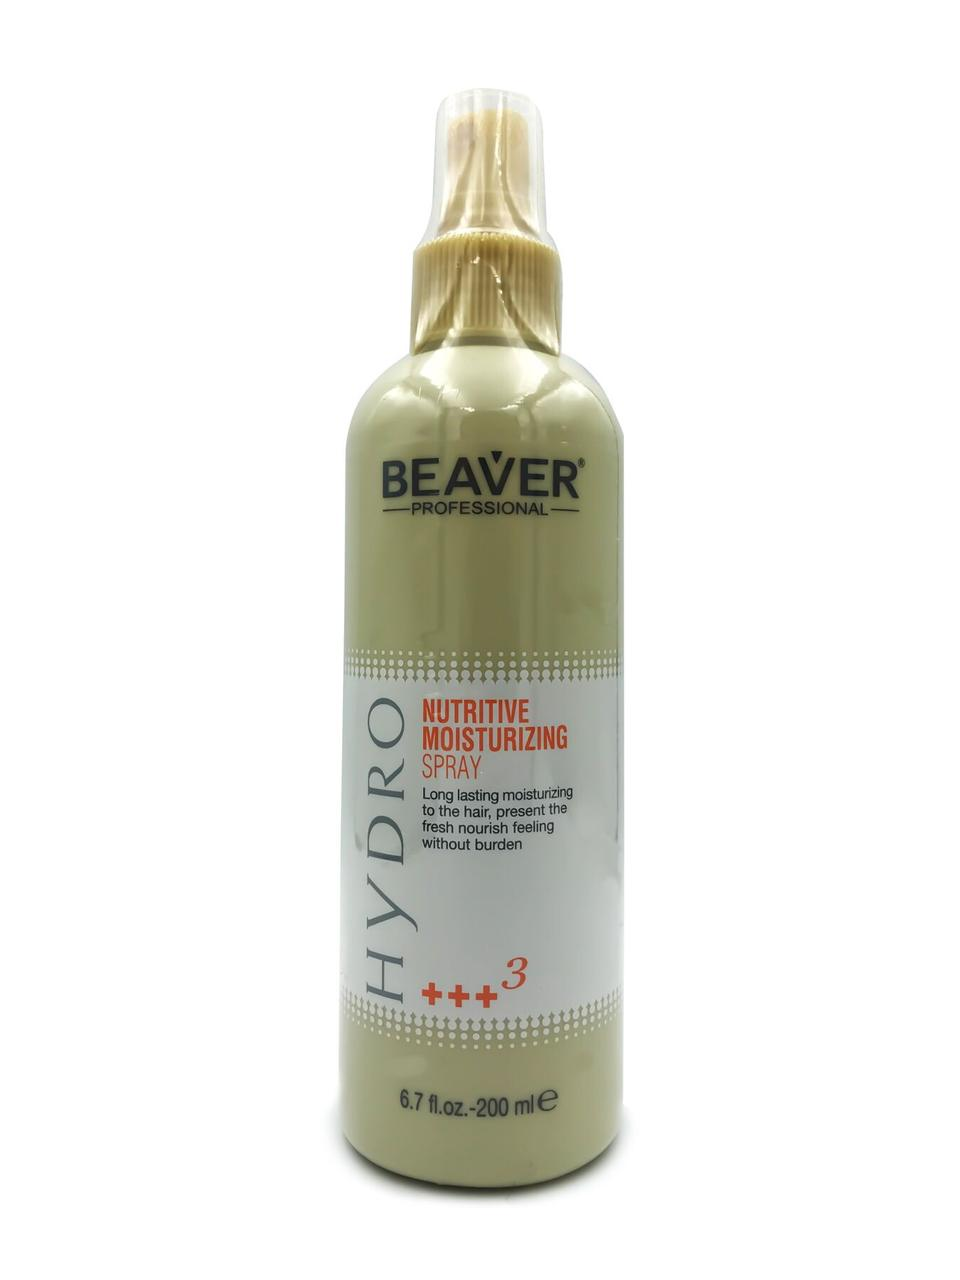 Beaver Hydro Nutritive Moisturizing Spray Спрей-кондиционер питательный увлажняющий 200 мл